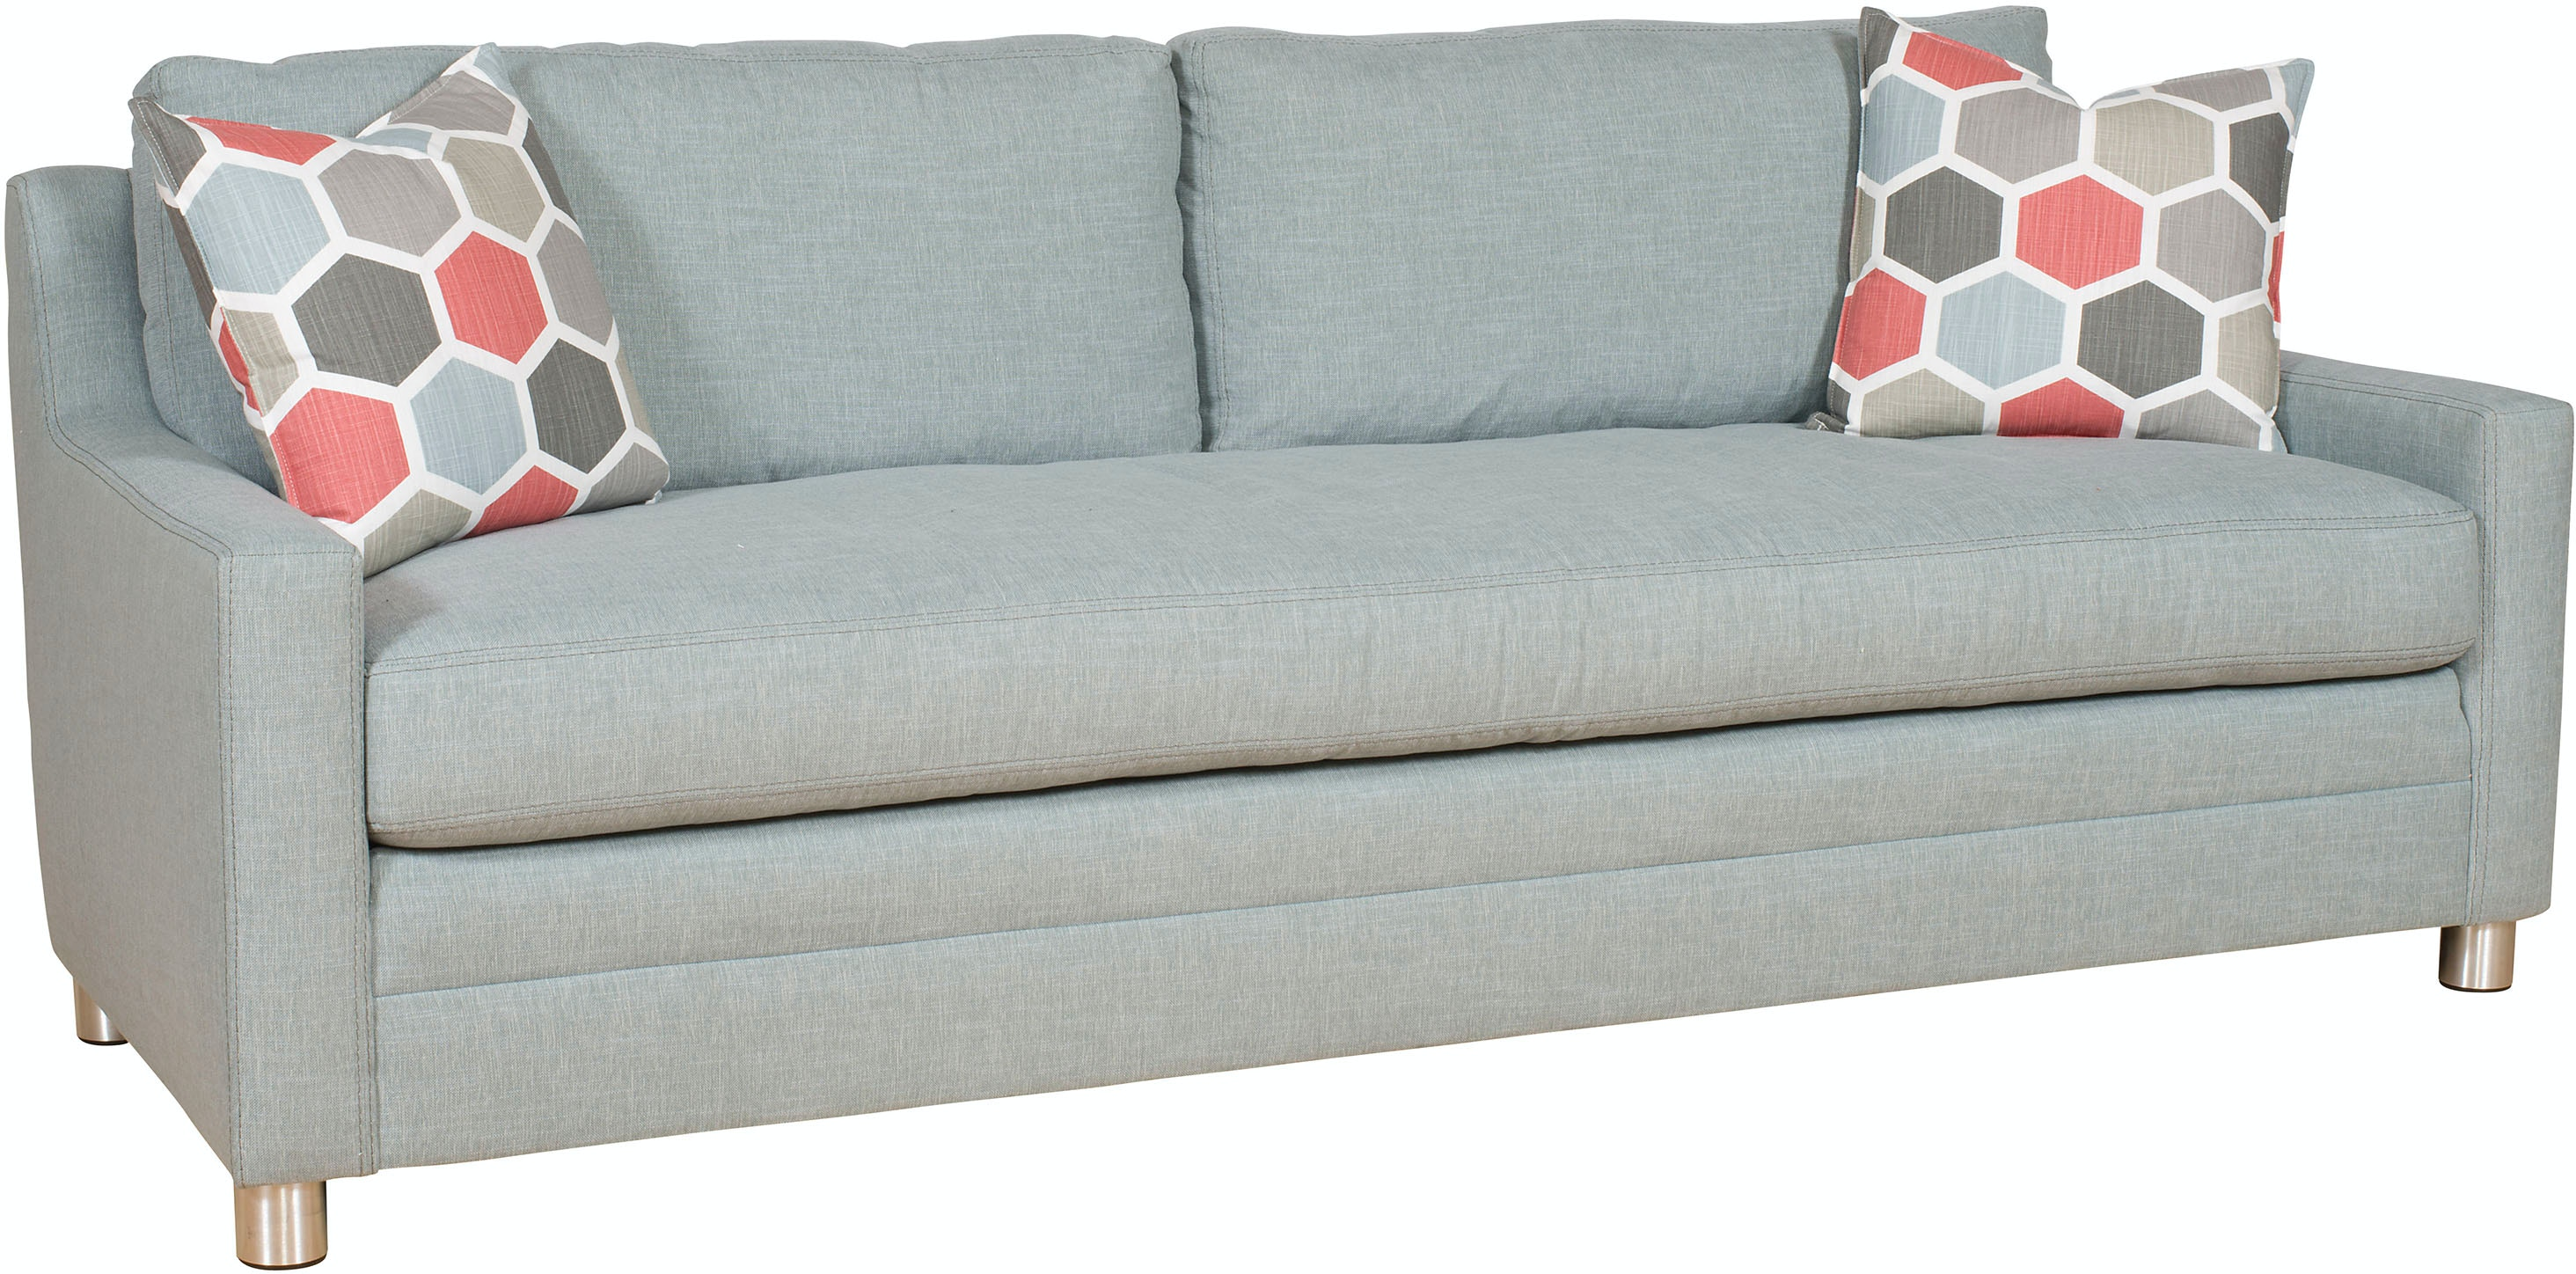 Vanguard Living Room Fairgrove Sofa 652 1s Oasis Rug Home  ~ Sofa Bed Jacksonville Fl